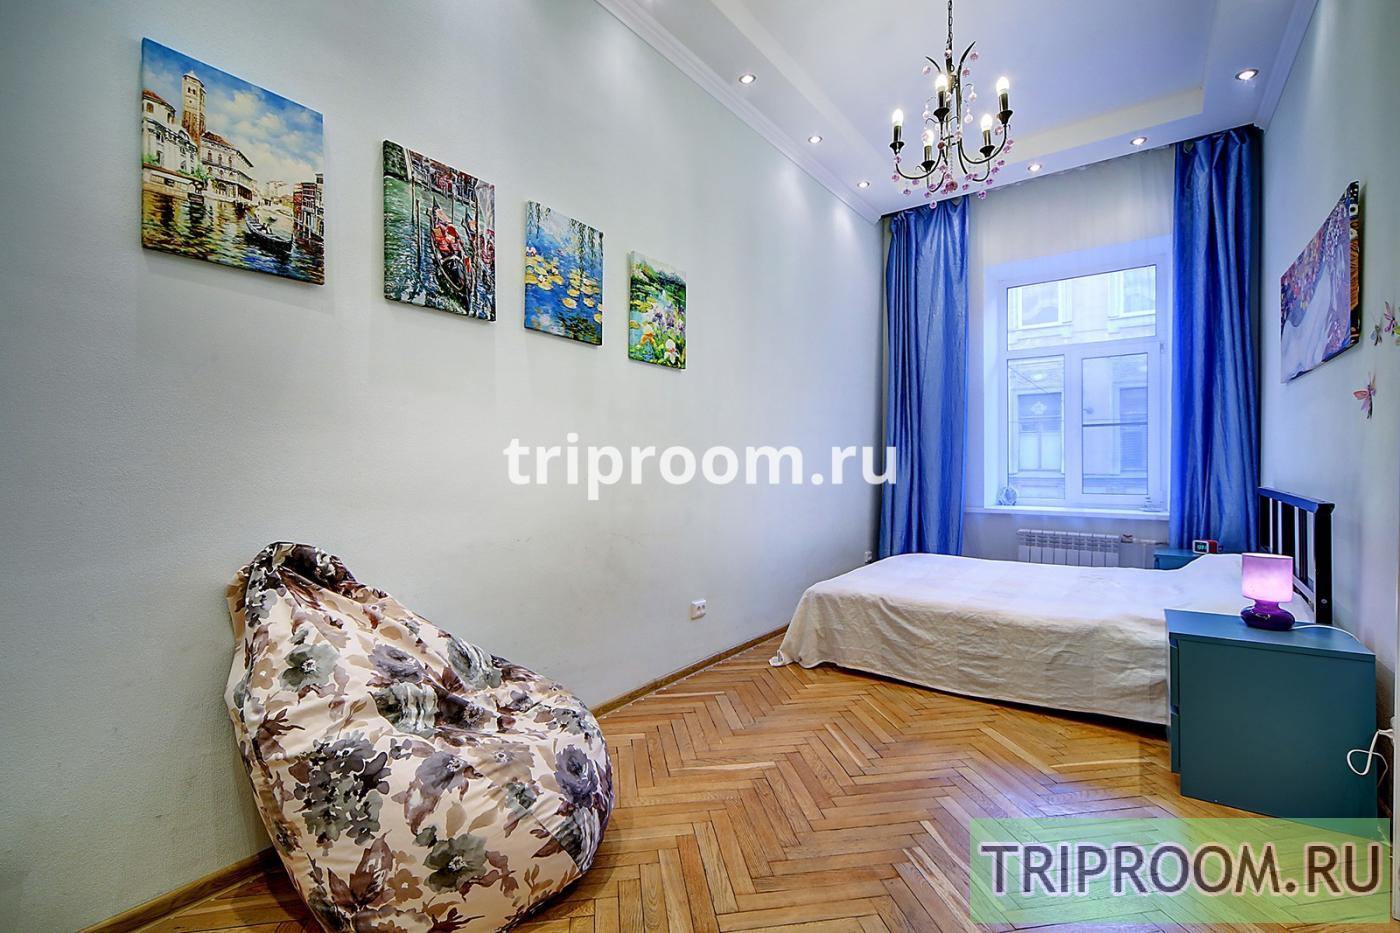 2-комнатная квартира посуточно (вариант № 15426), ул. Лиговский проспект, фото № 13